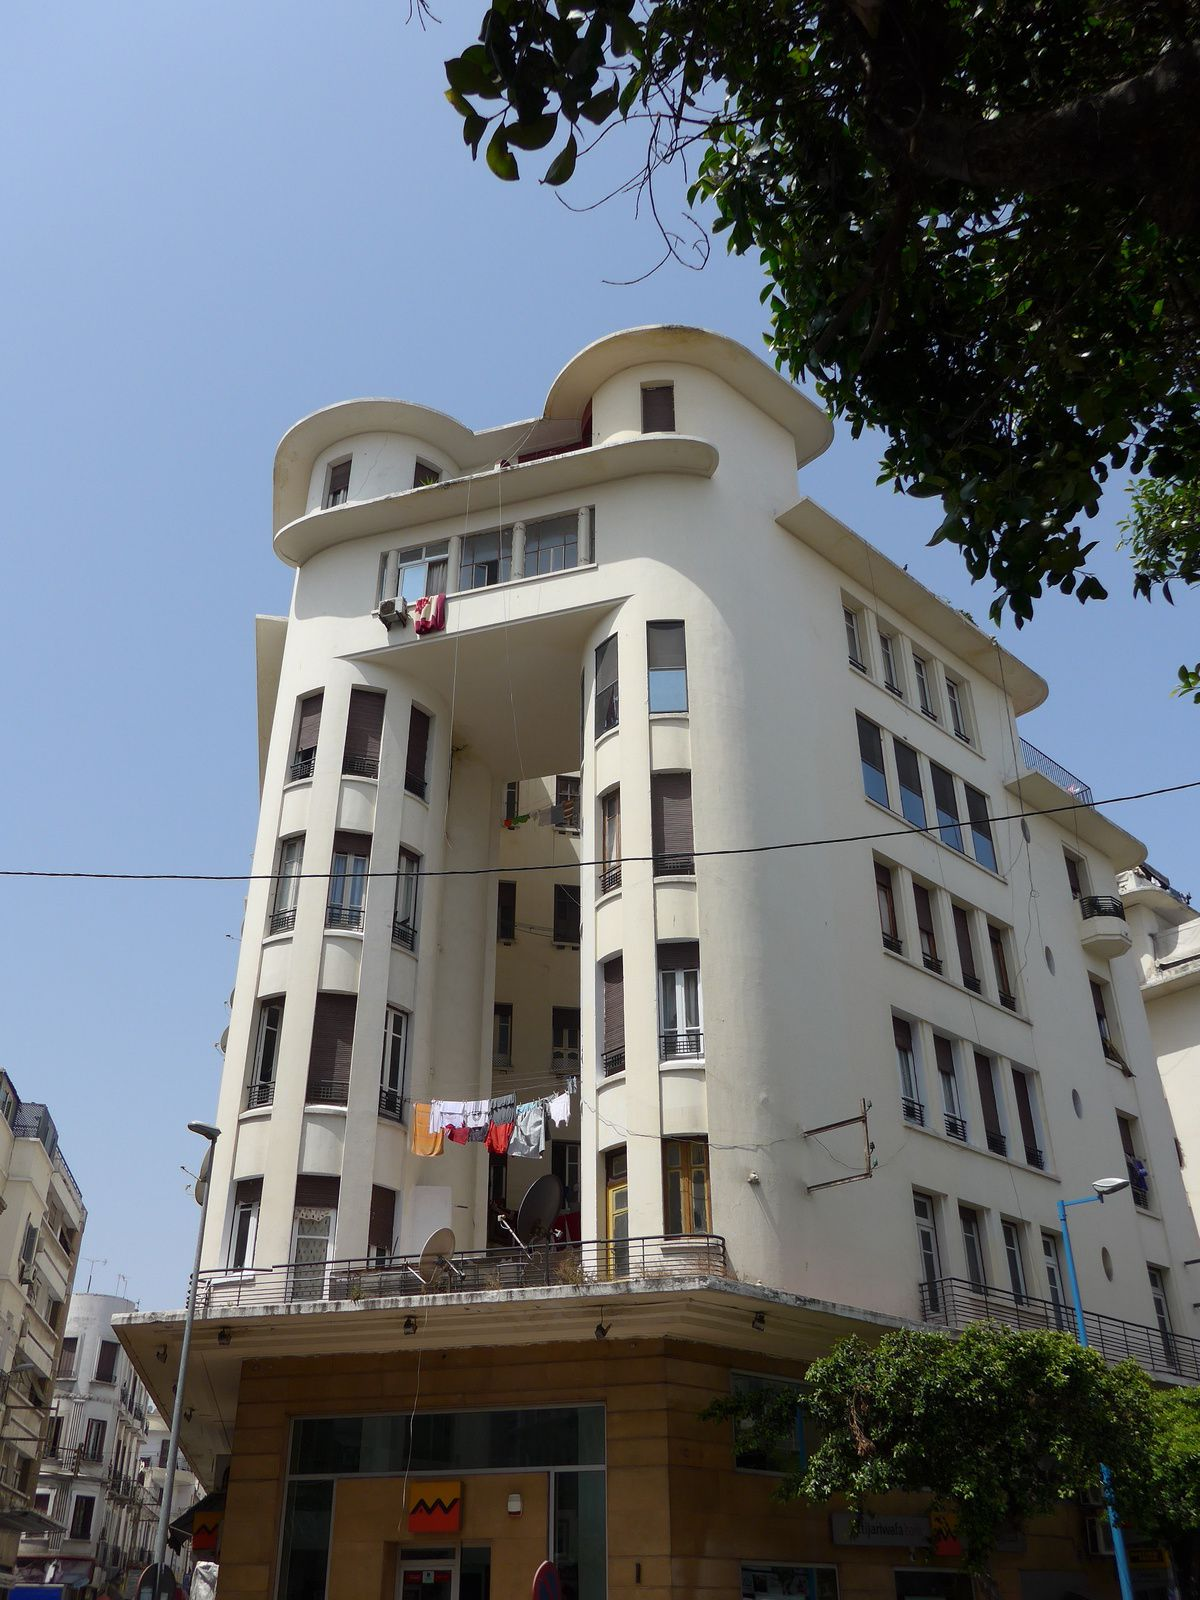 Maroc pays de contrastes for Architecte casablanca